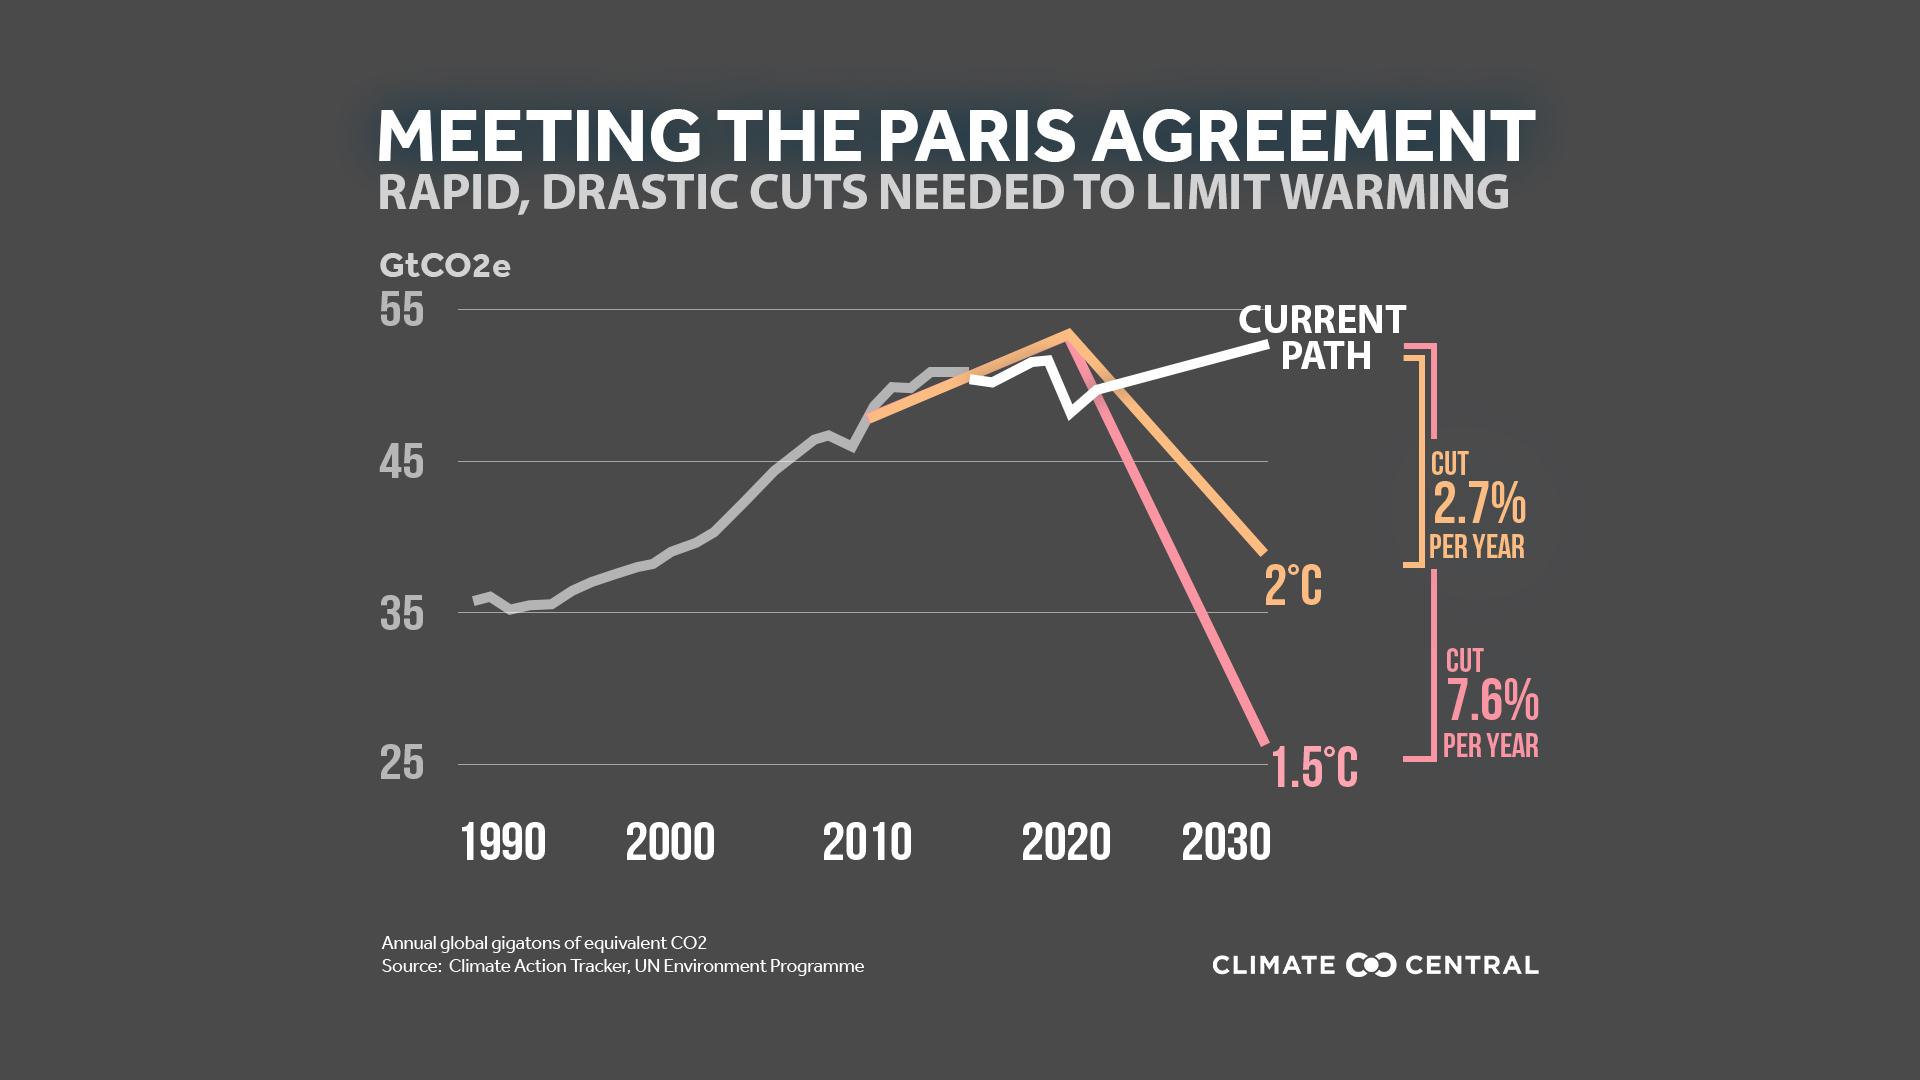 Return to the Paris Agreement